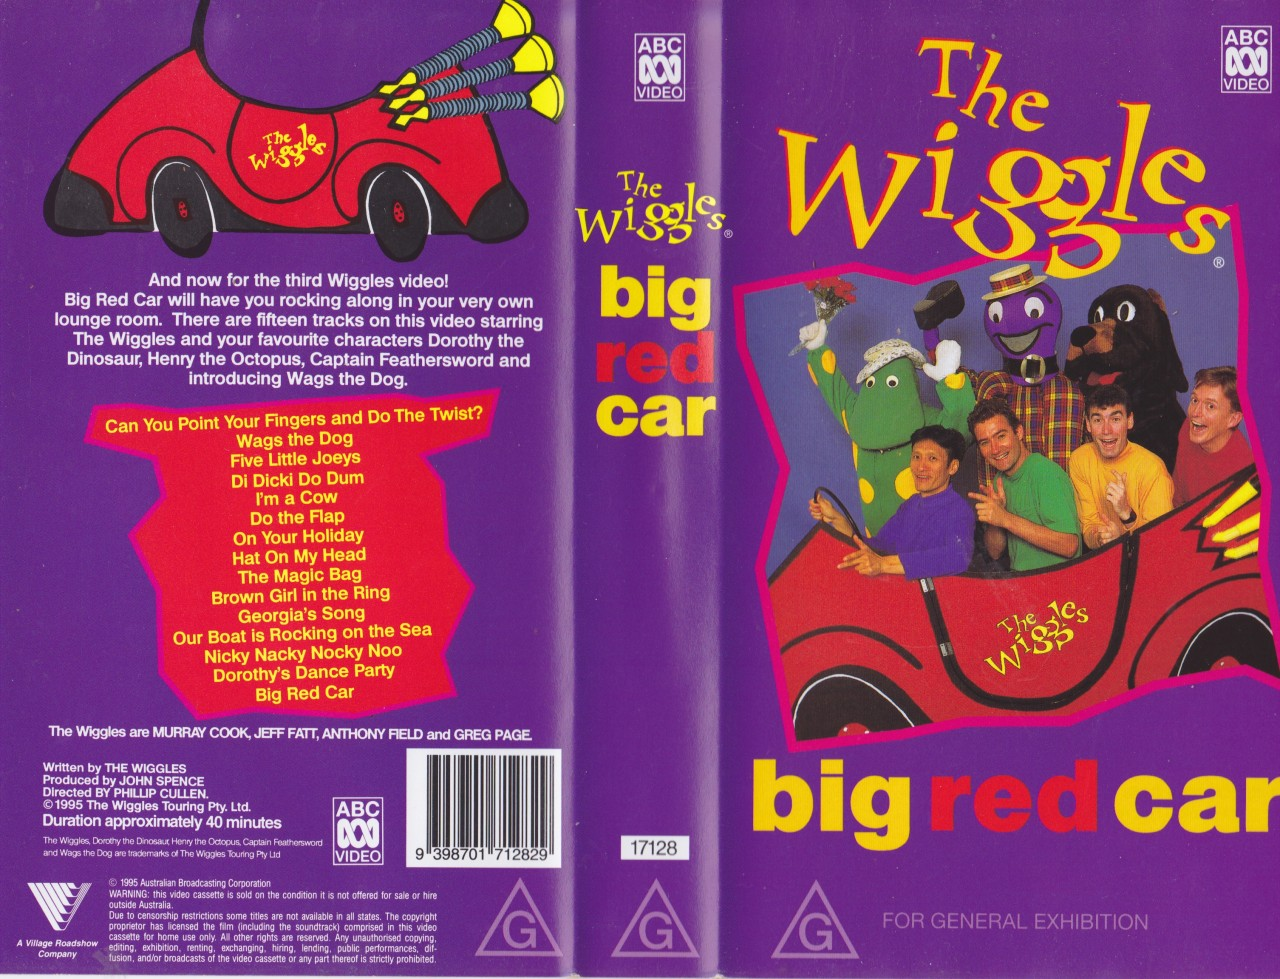 The Wiggles Big Red Car Vhs Video Pal A Rare Find Ebay